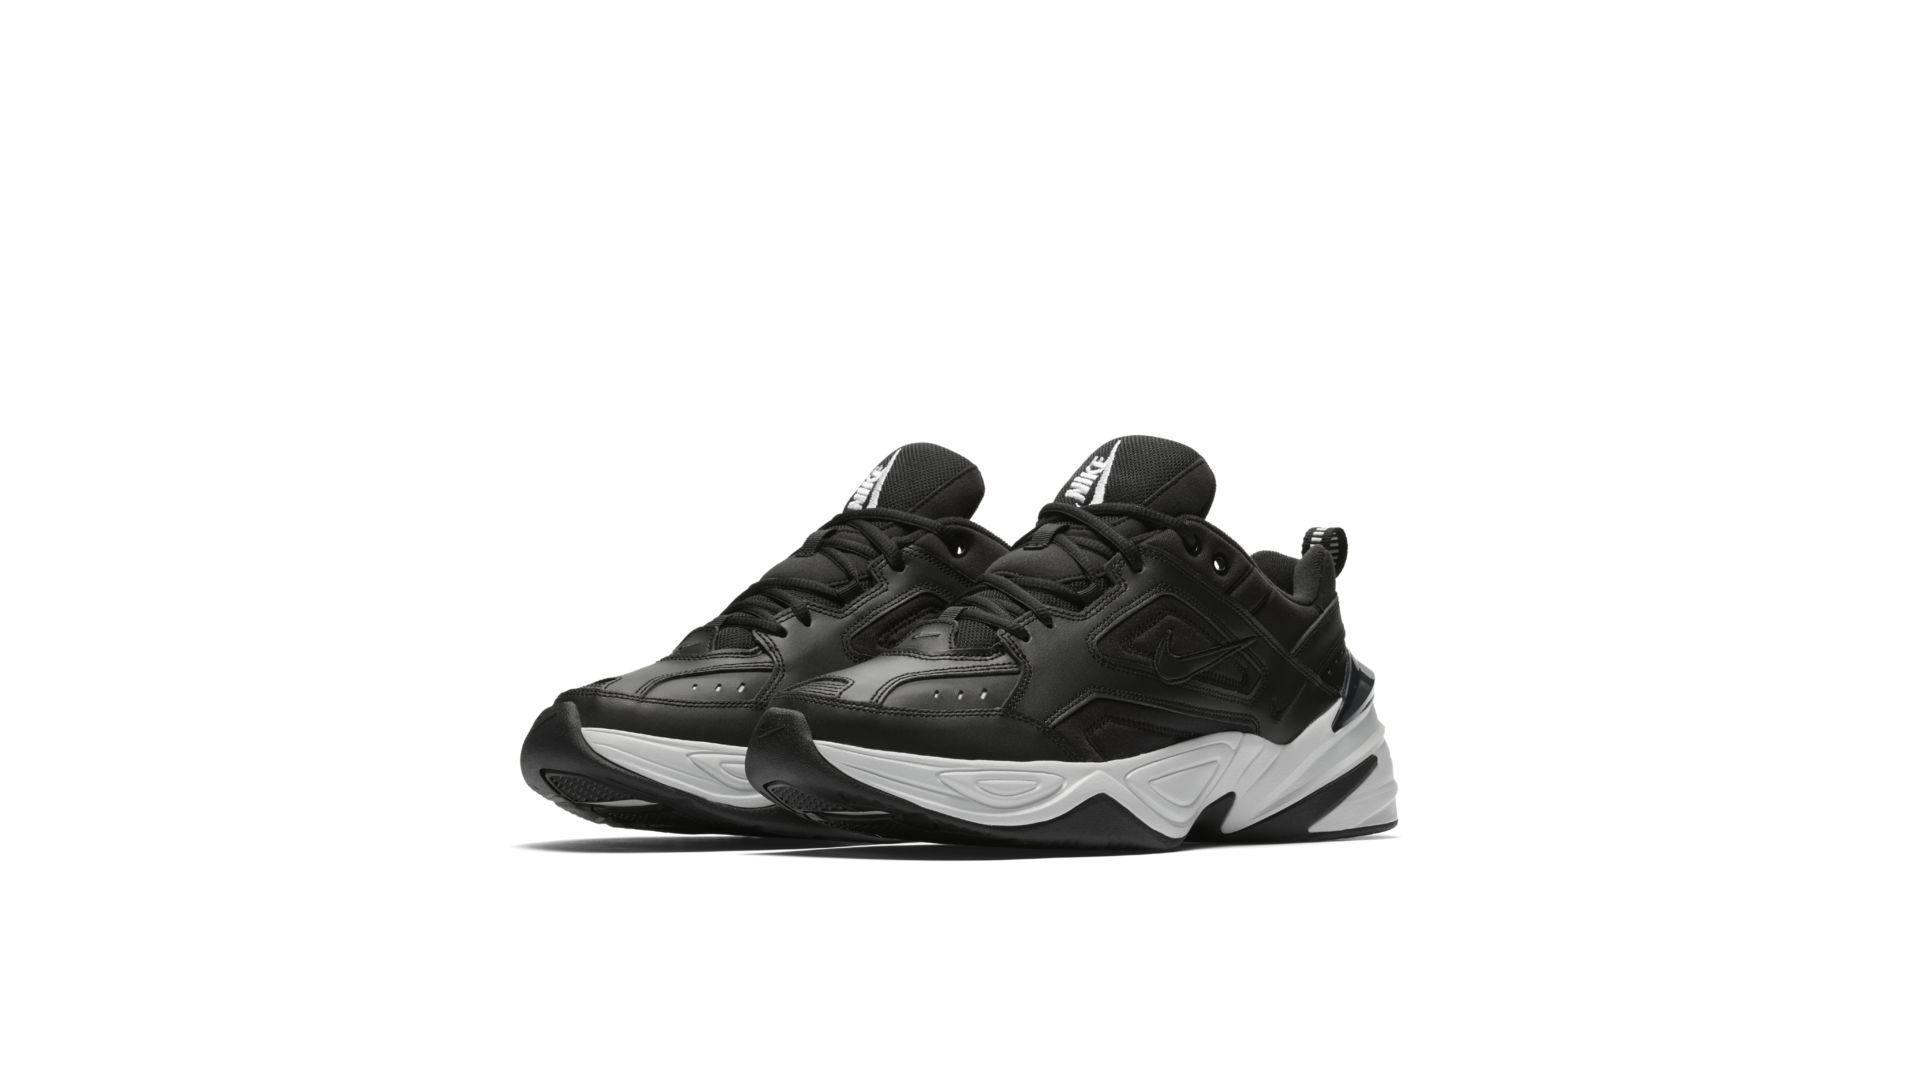 Nike M2k Tekno BlackBlack Off White Obsidian (AV4789 002)